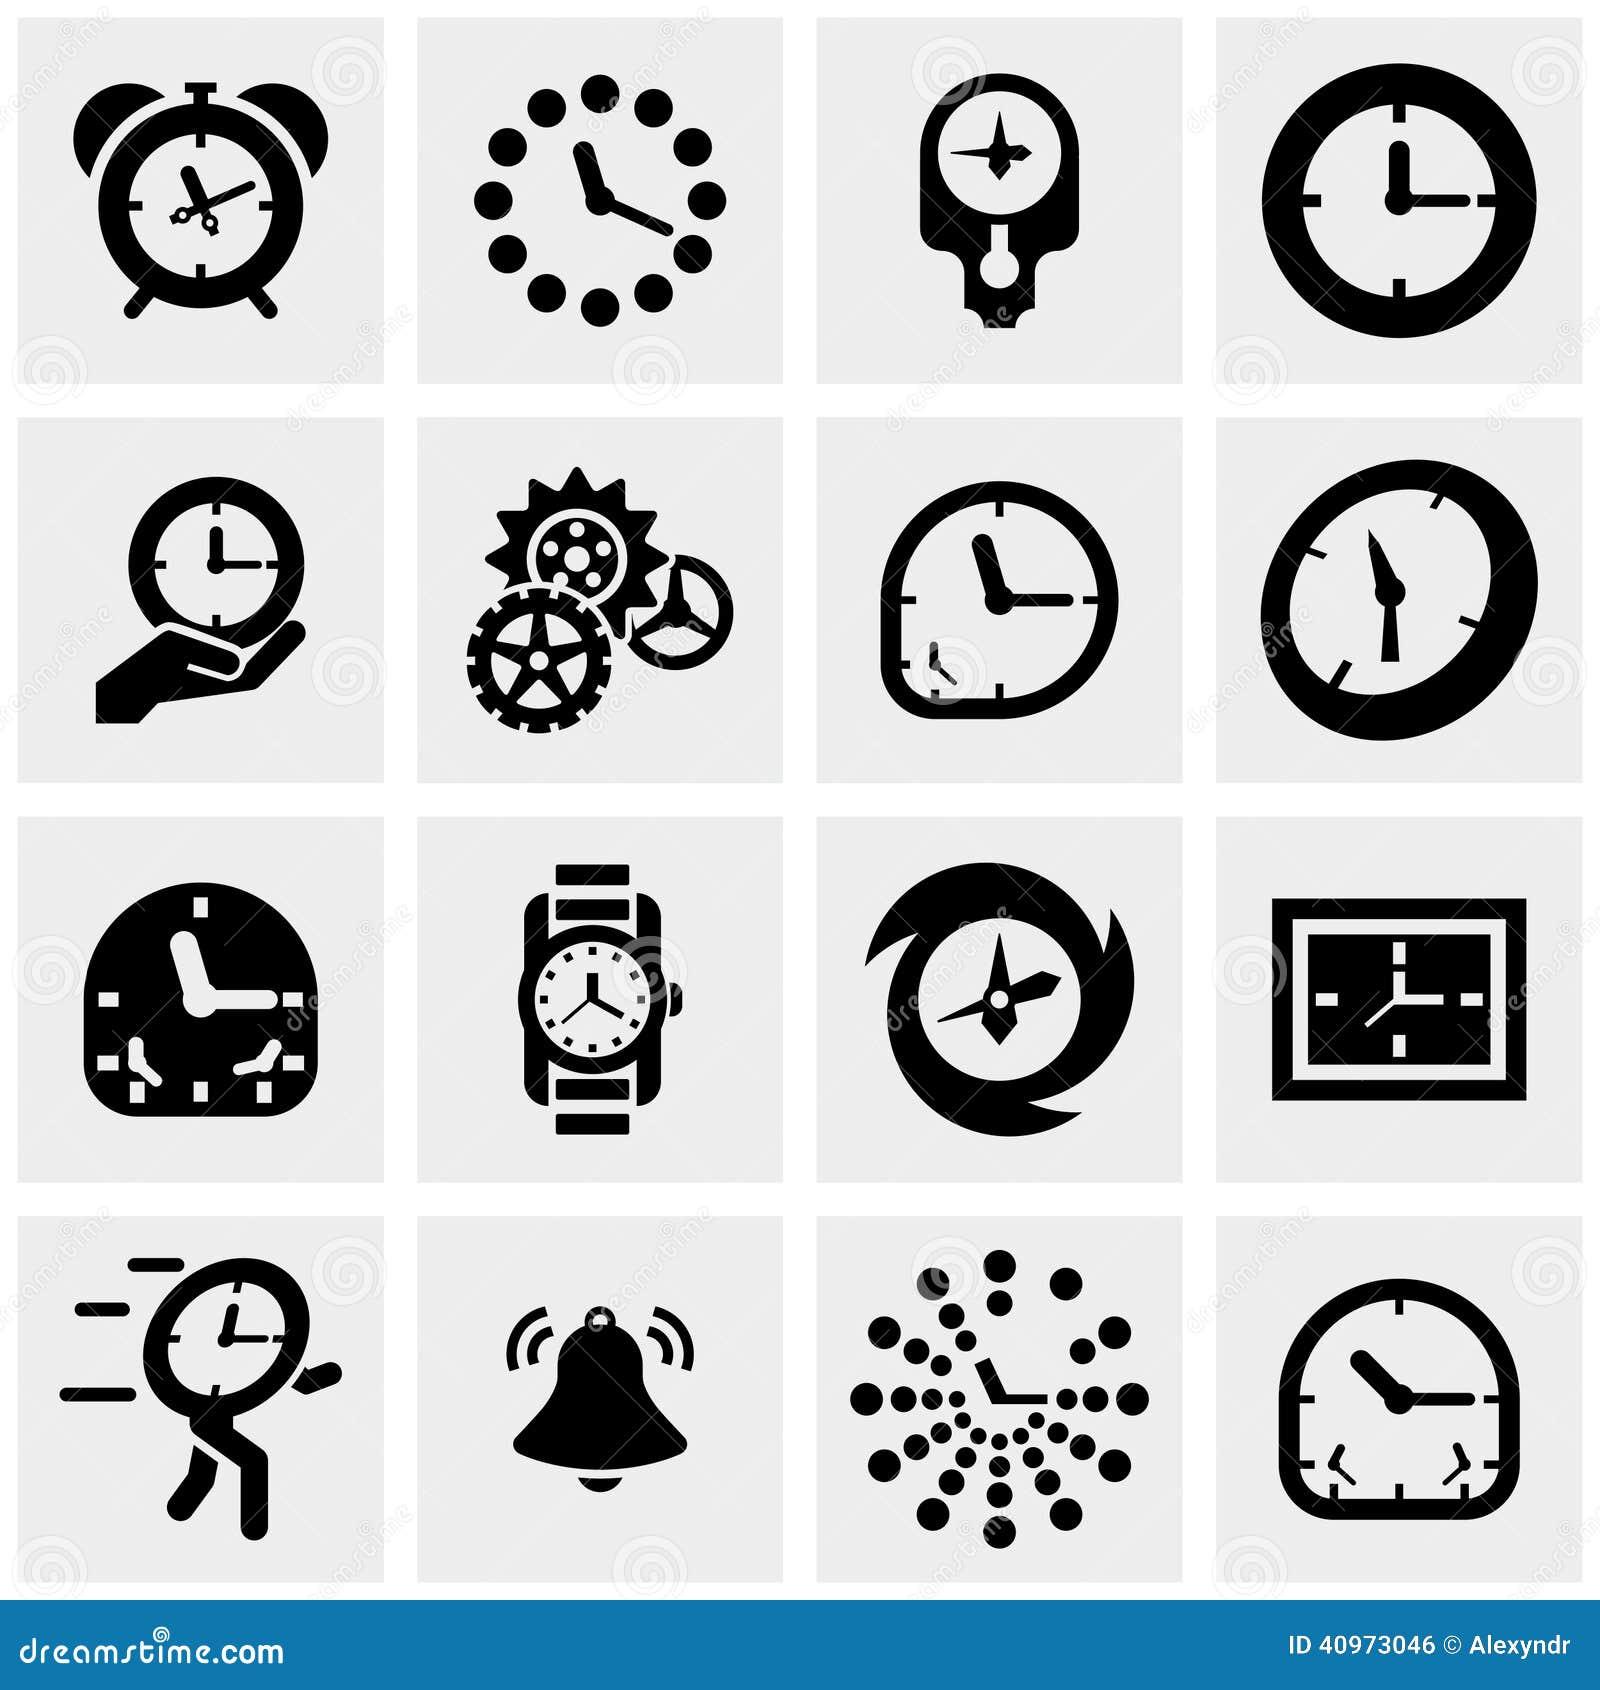 Clocks vector icons set on gray